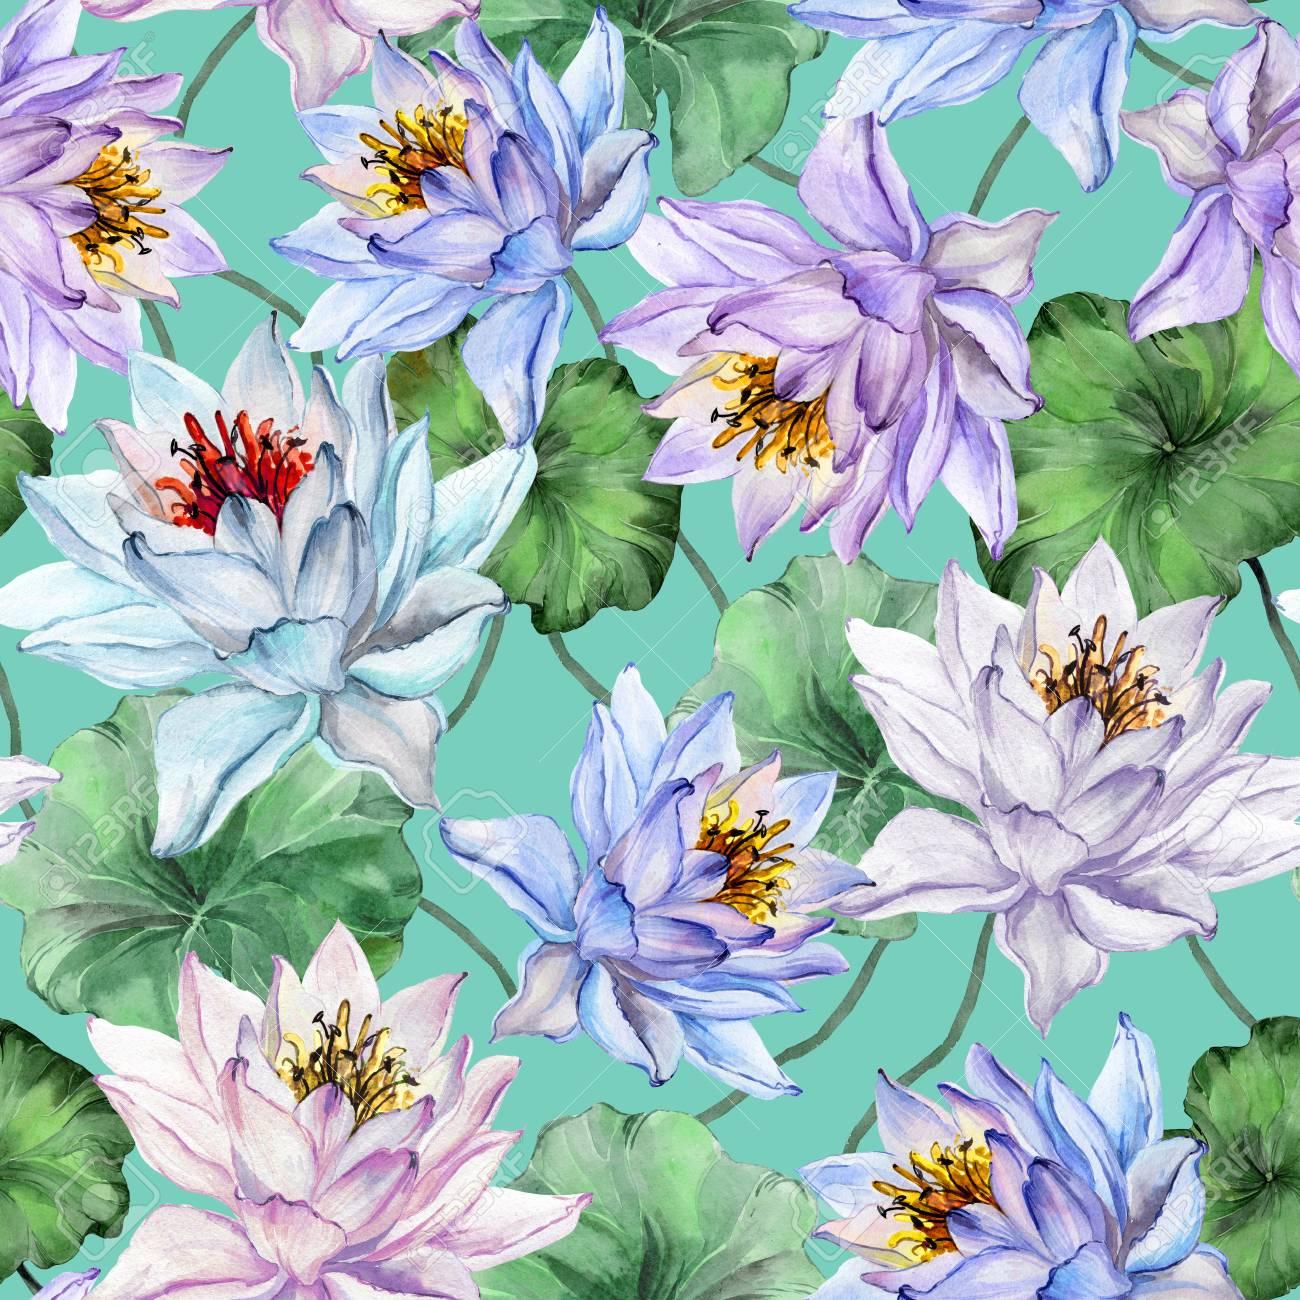 Beautiful floral seamless pattern large colorful lotus flowers beautiful floral seamless pattern large colorful lotus flowers with leaves on turquoise background hand mightylinksfo